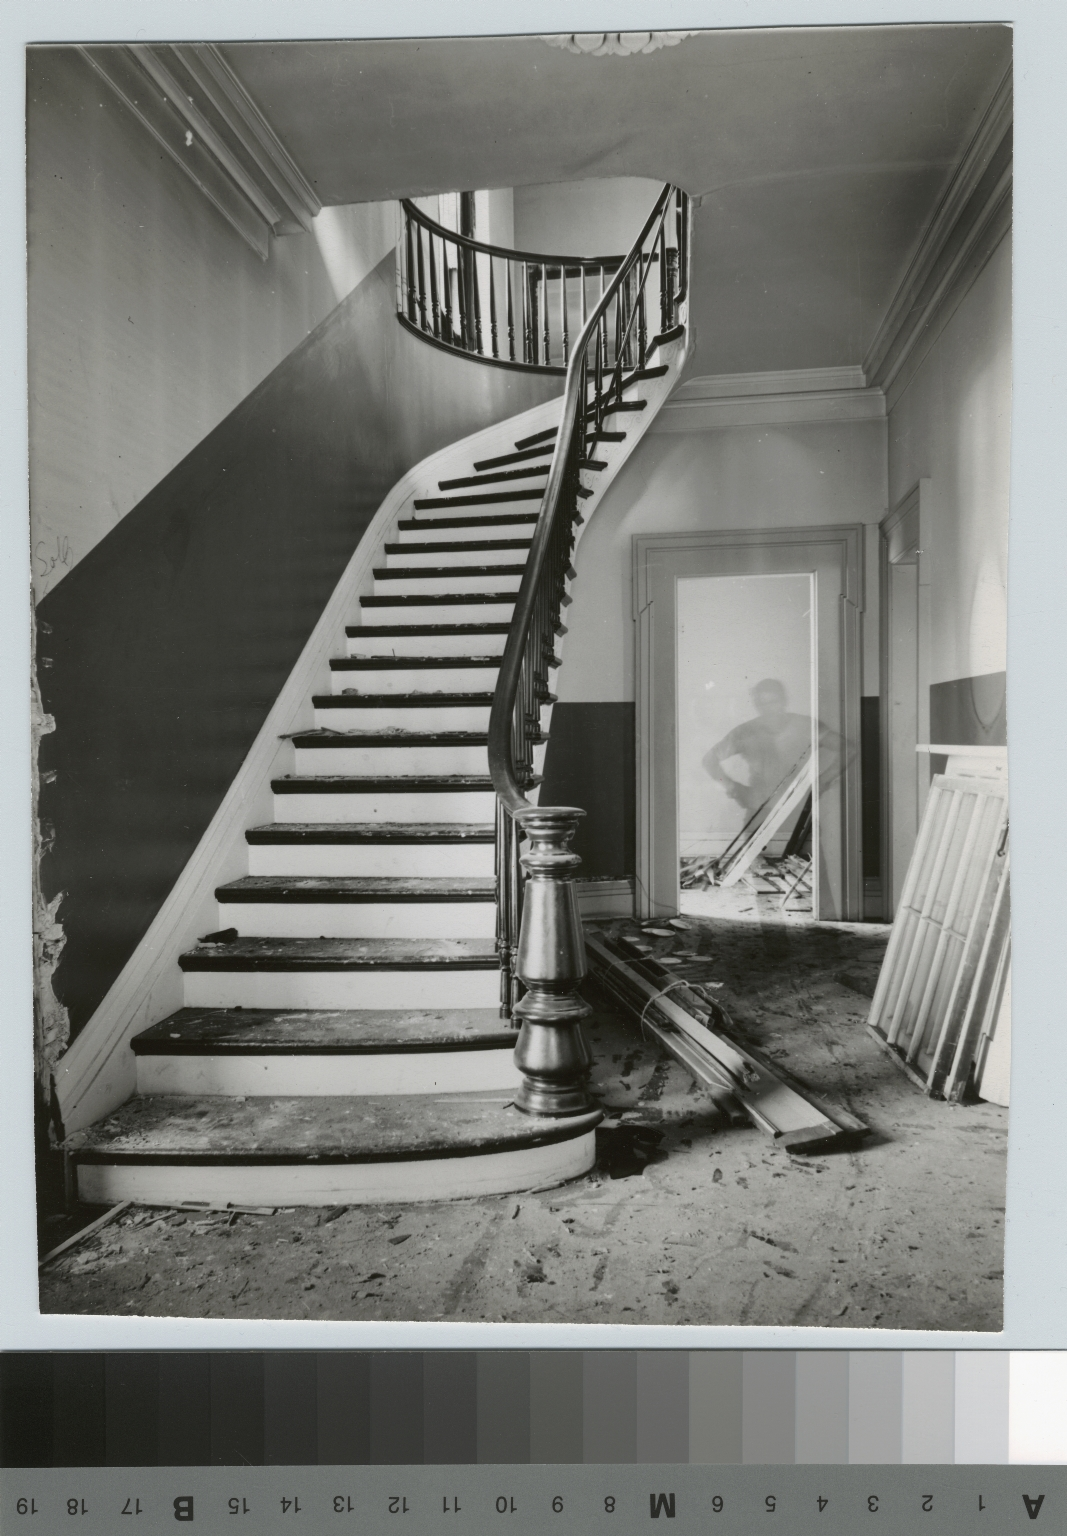 Stairway, Clark Union, Rochester Athenaeum and Mechanics Institute